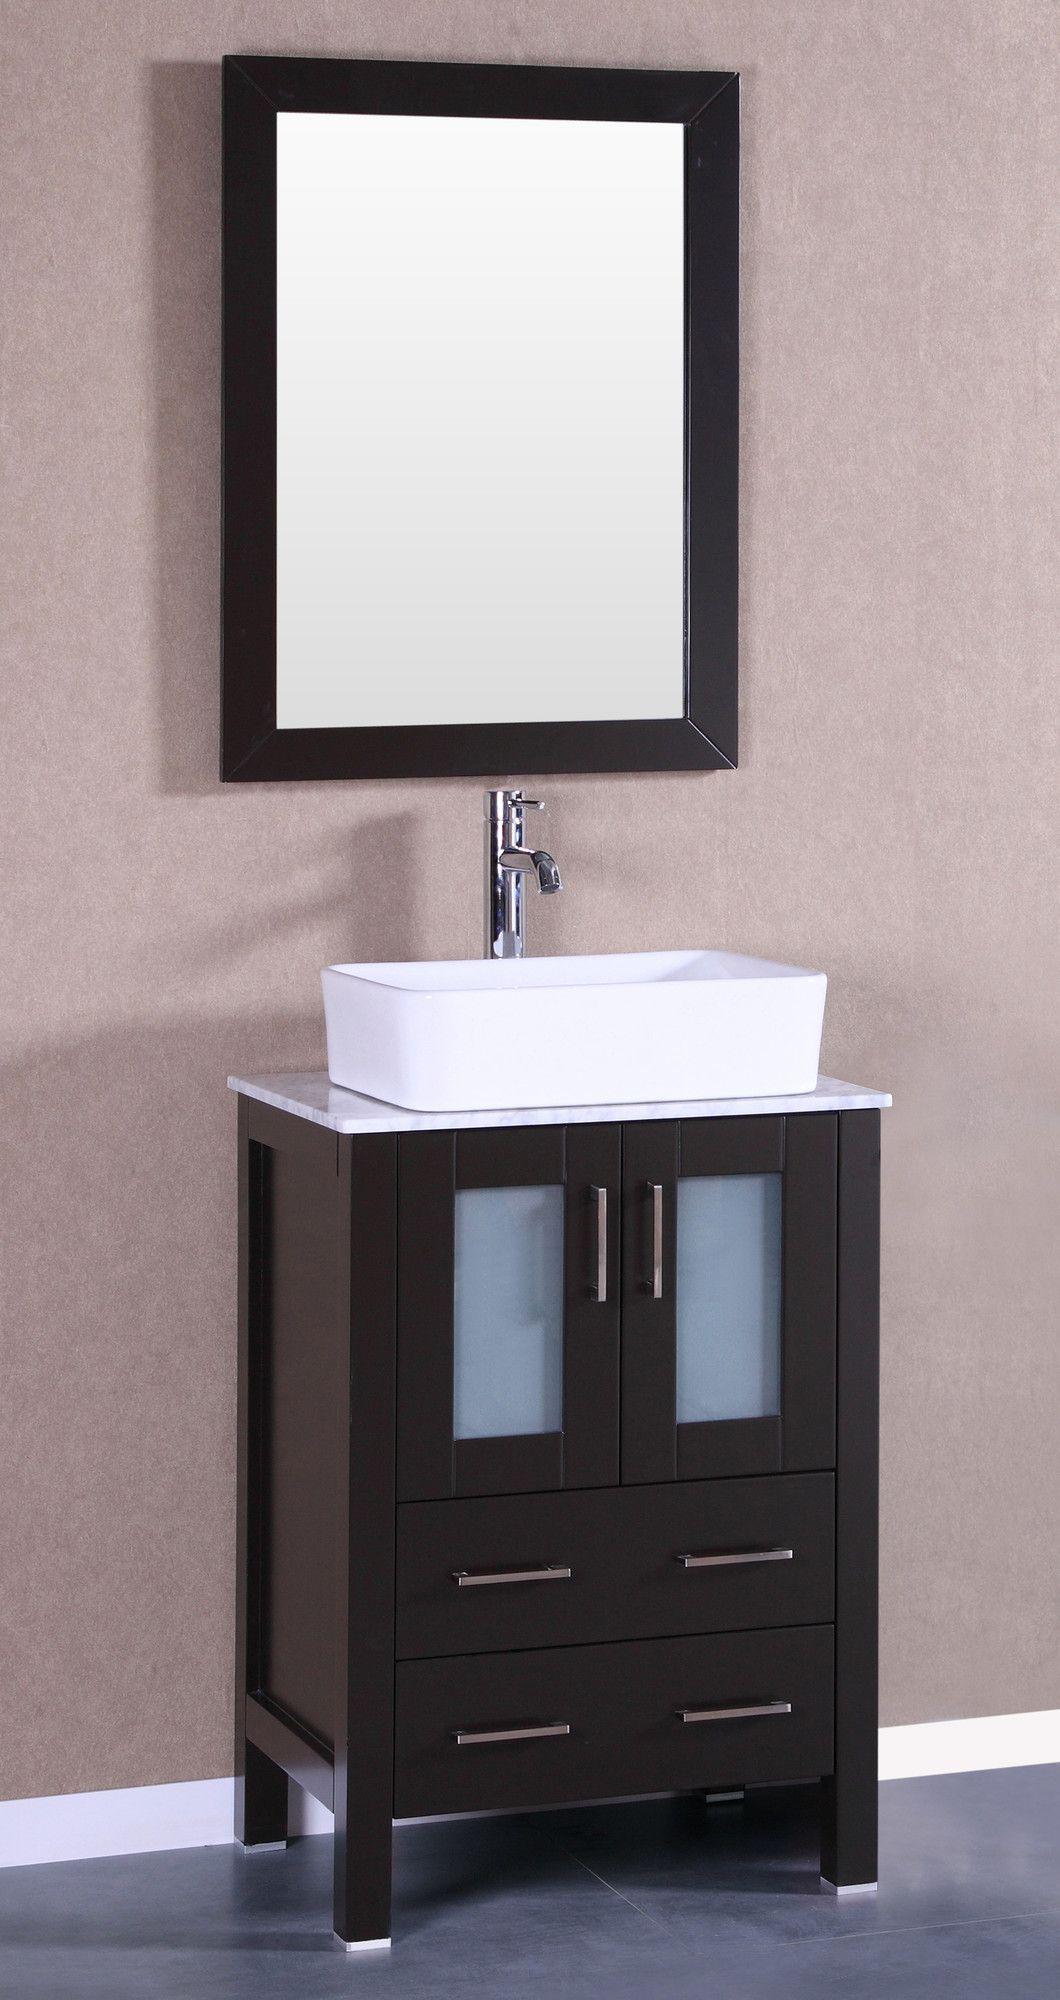 Azucena 24 5 Wall Mounted Single Bathroom Vanity Single